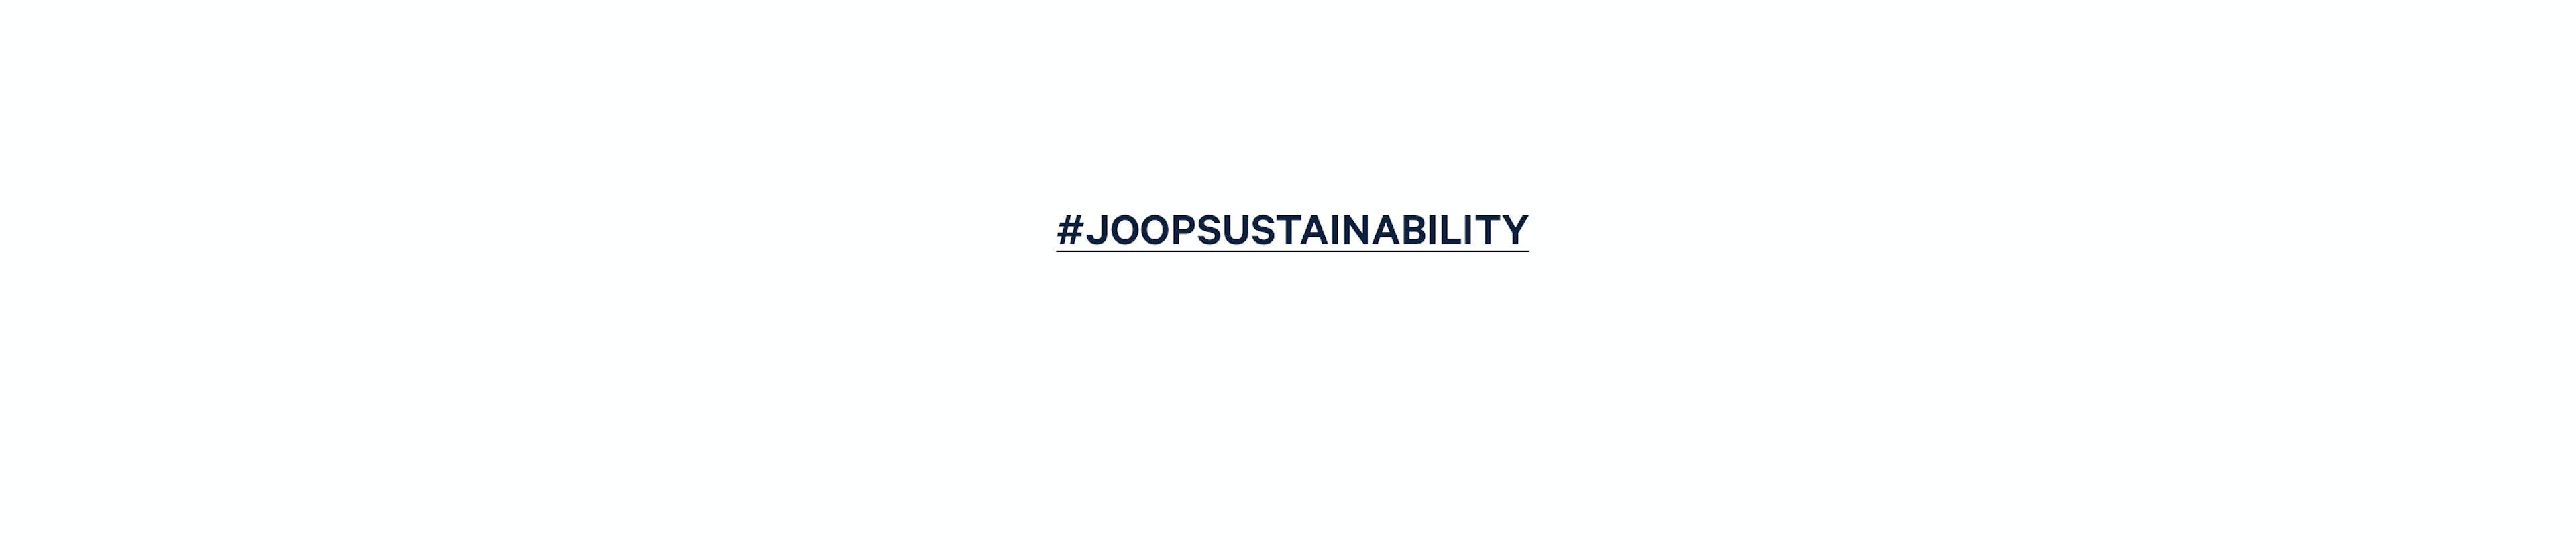 #joopsustainability